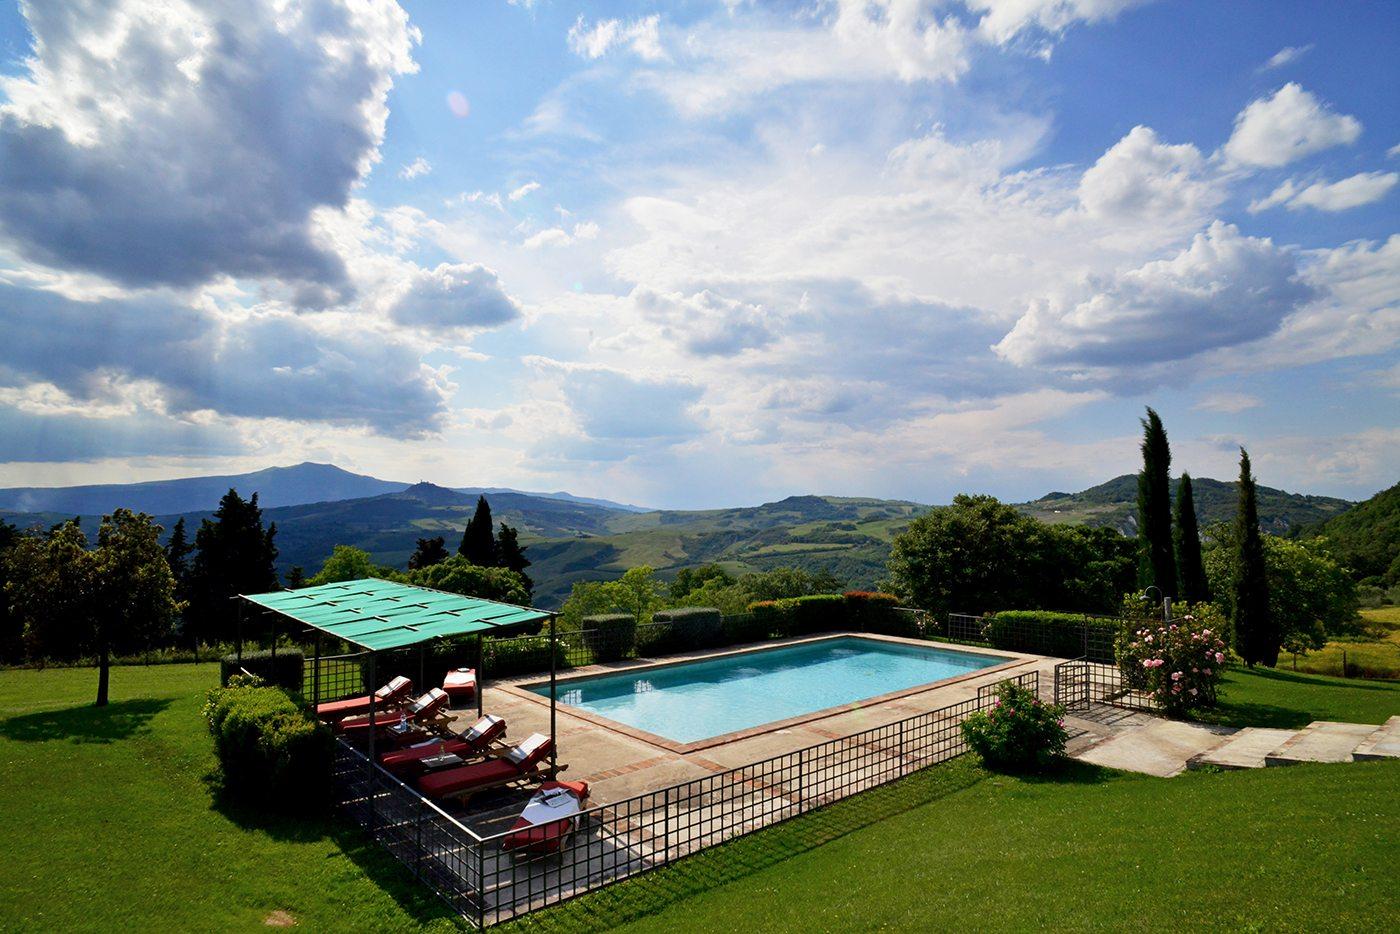 3_pool-with-view-to-monte-amiata_dsc_3613